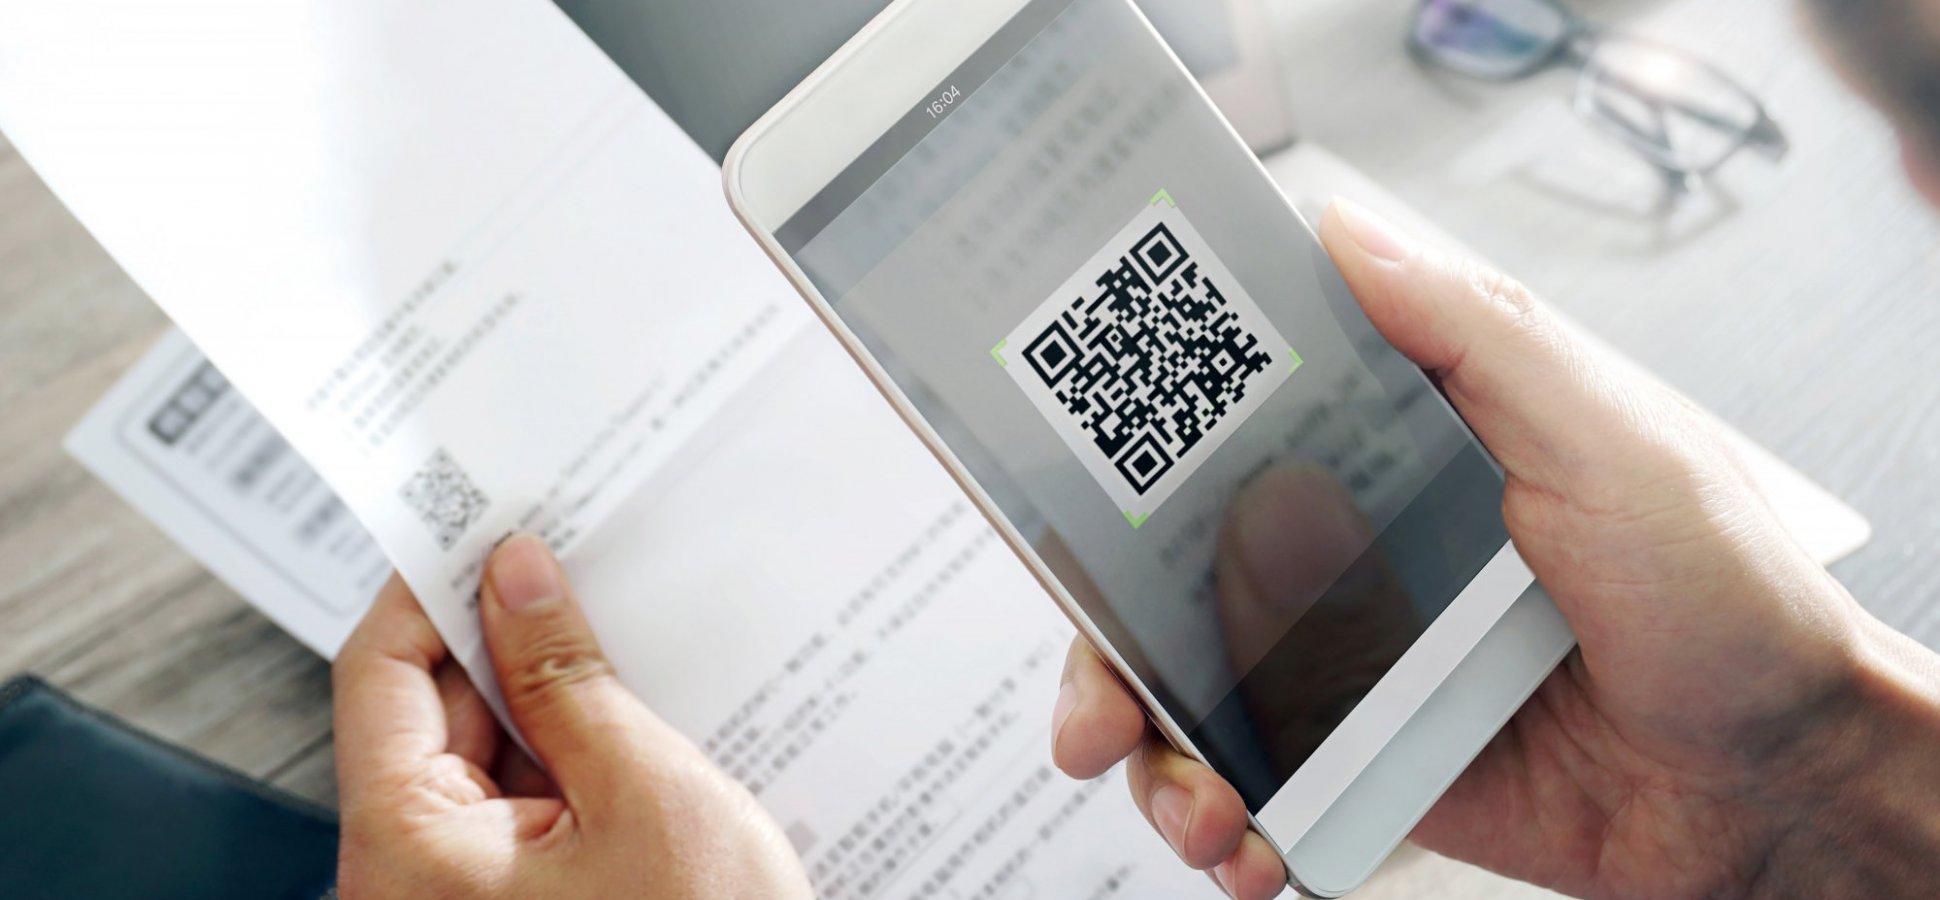 codes communication.txt | Business